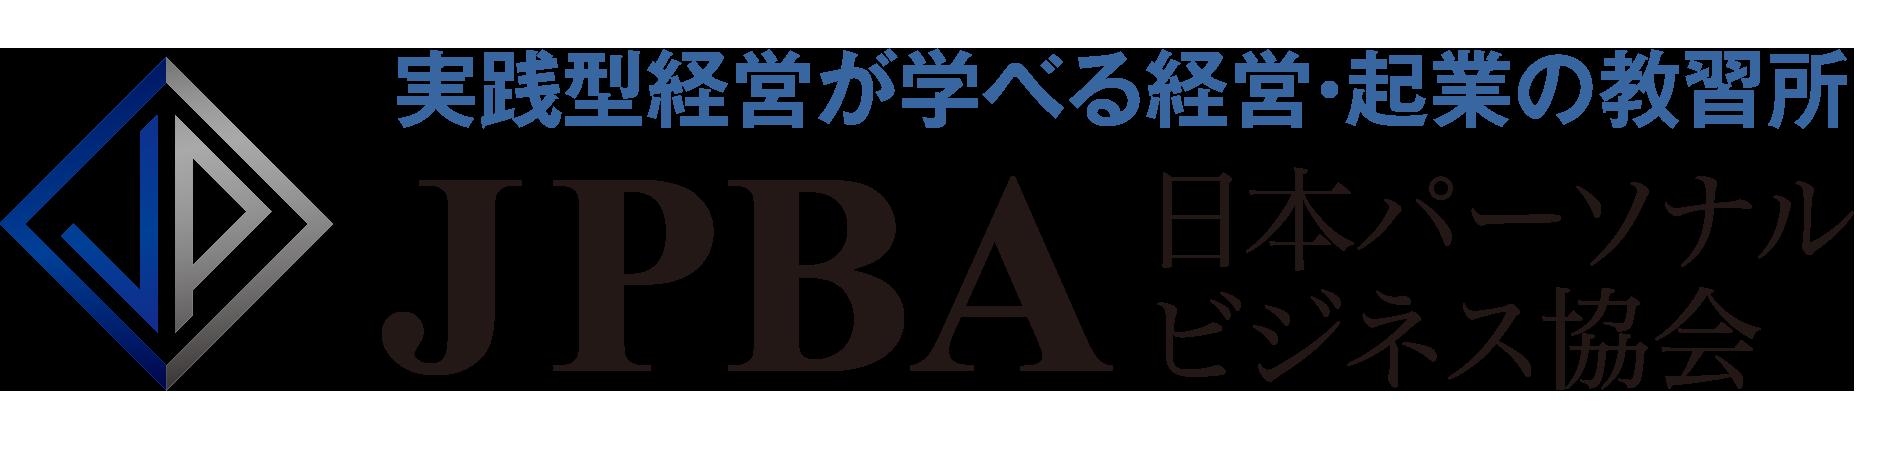 JPBA|一般社団法人日本パーソナルビジネス協会|個人に経営力を。次世代の経営者・事業家・起業家を育成する